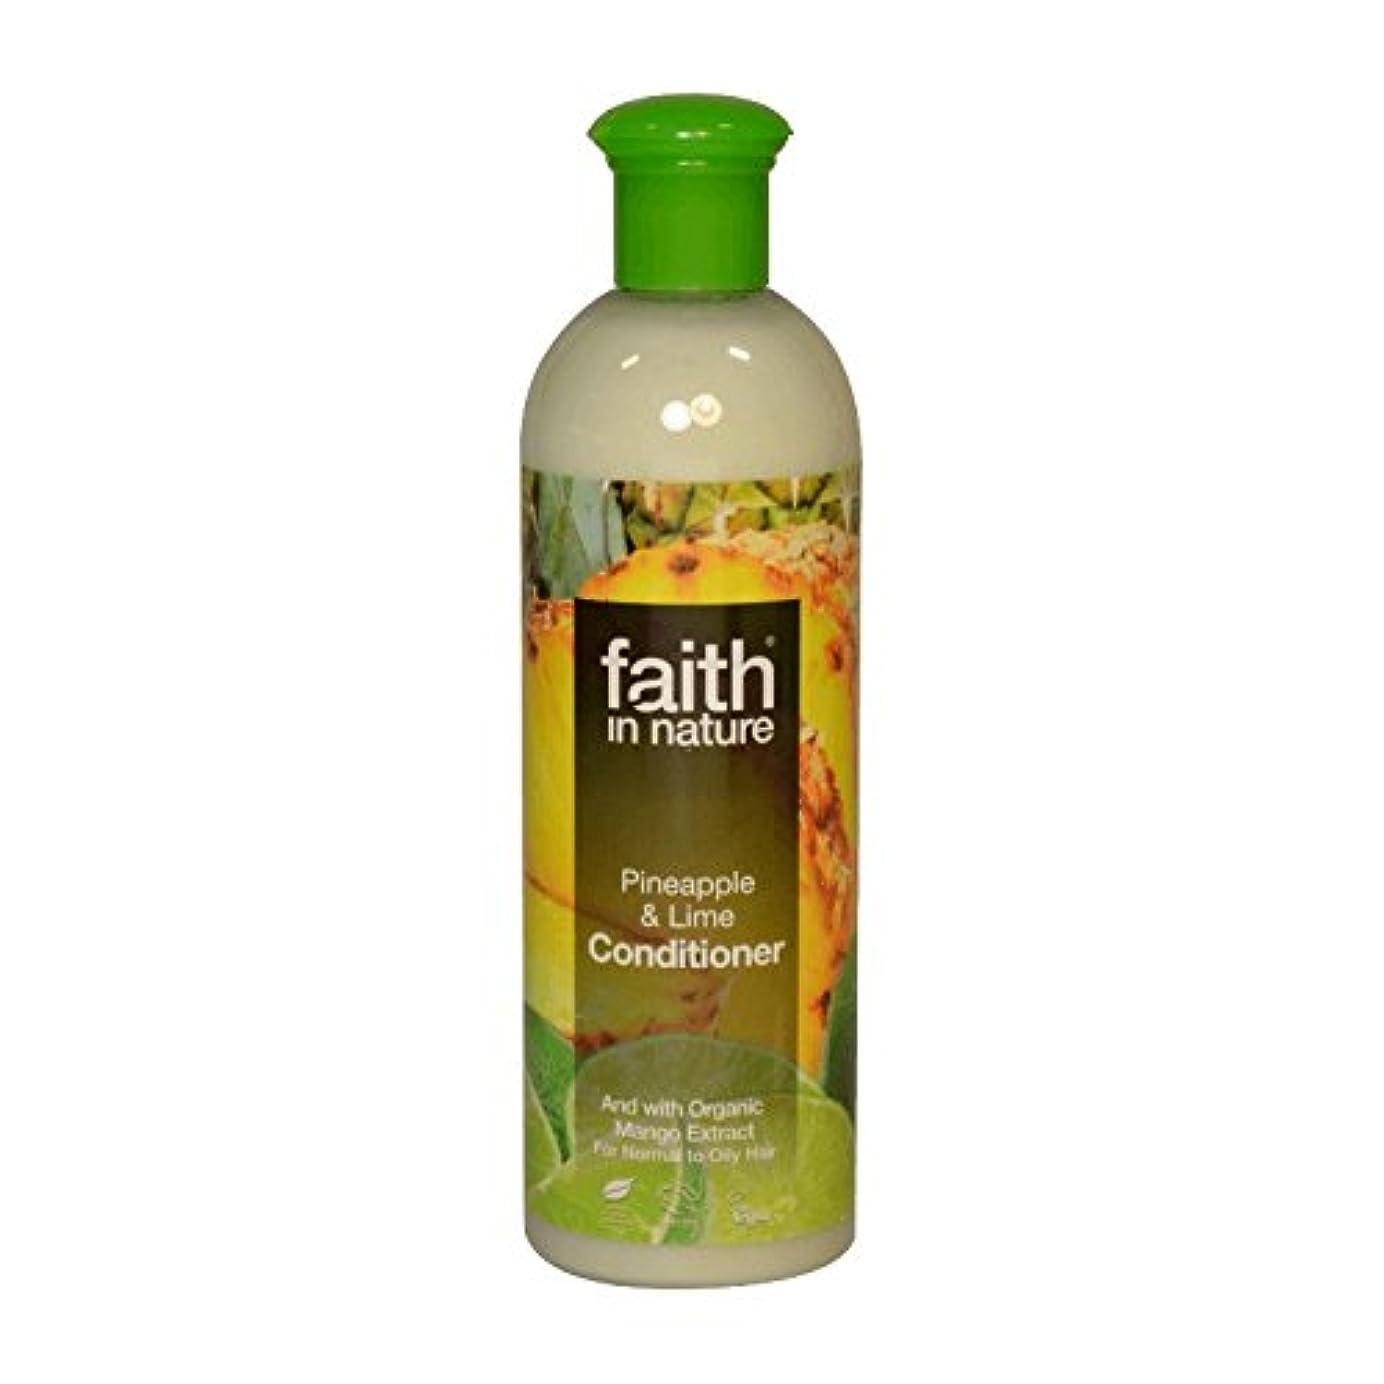 Faith in Nature Pineapple & Lime Conditioner 400ml (Pack of 6) - 自然パイナップル&ライムコンディショナー400ミリリットルの信仰 (x6) [並行輸入品]